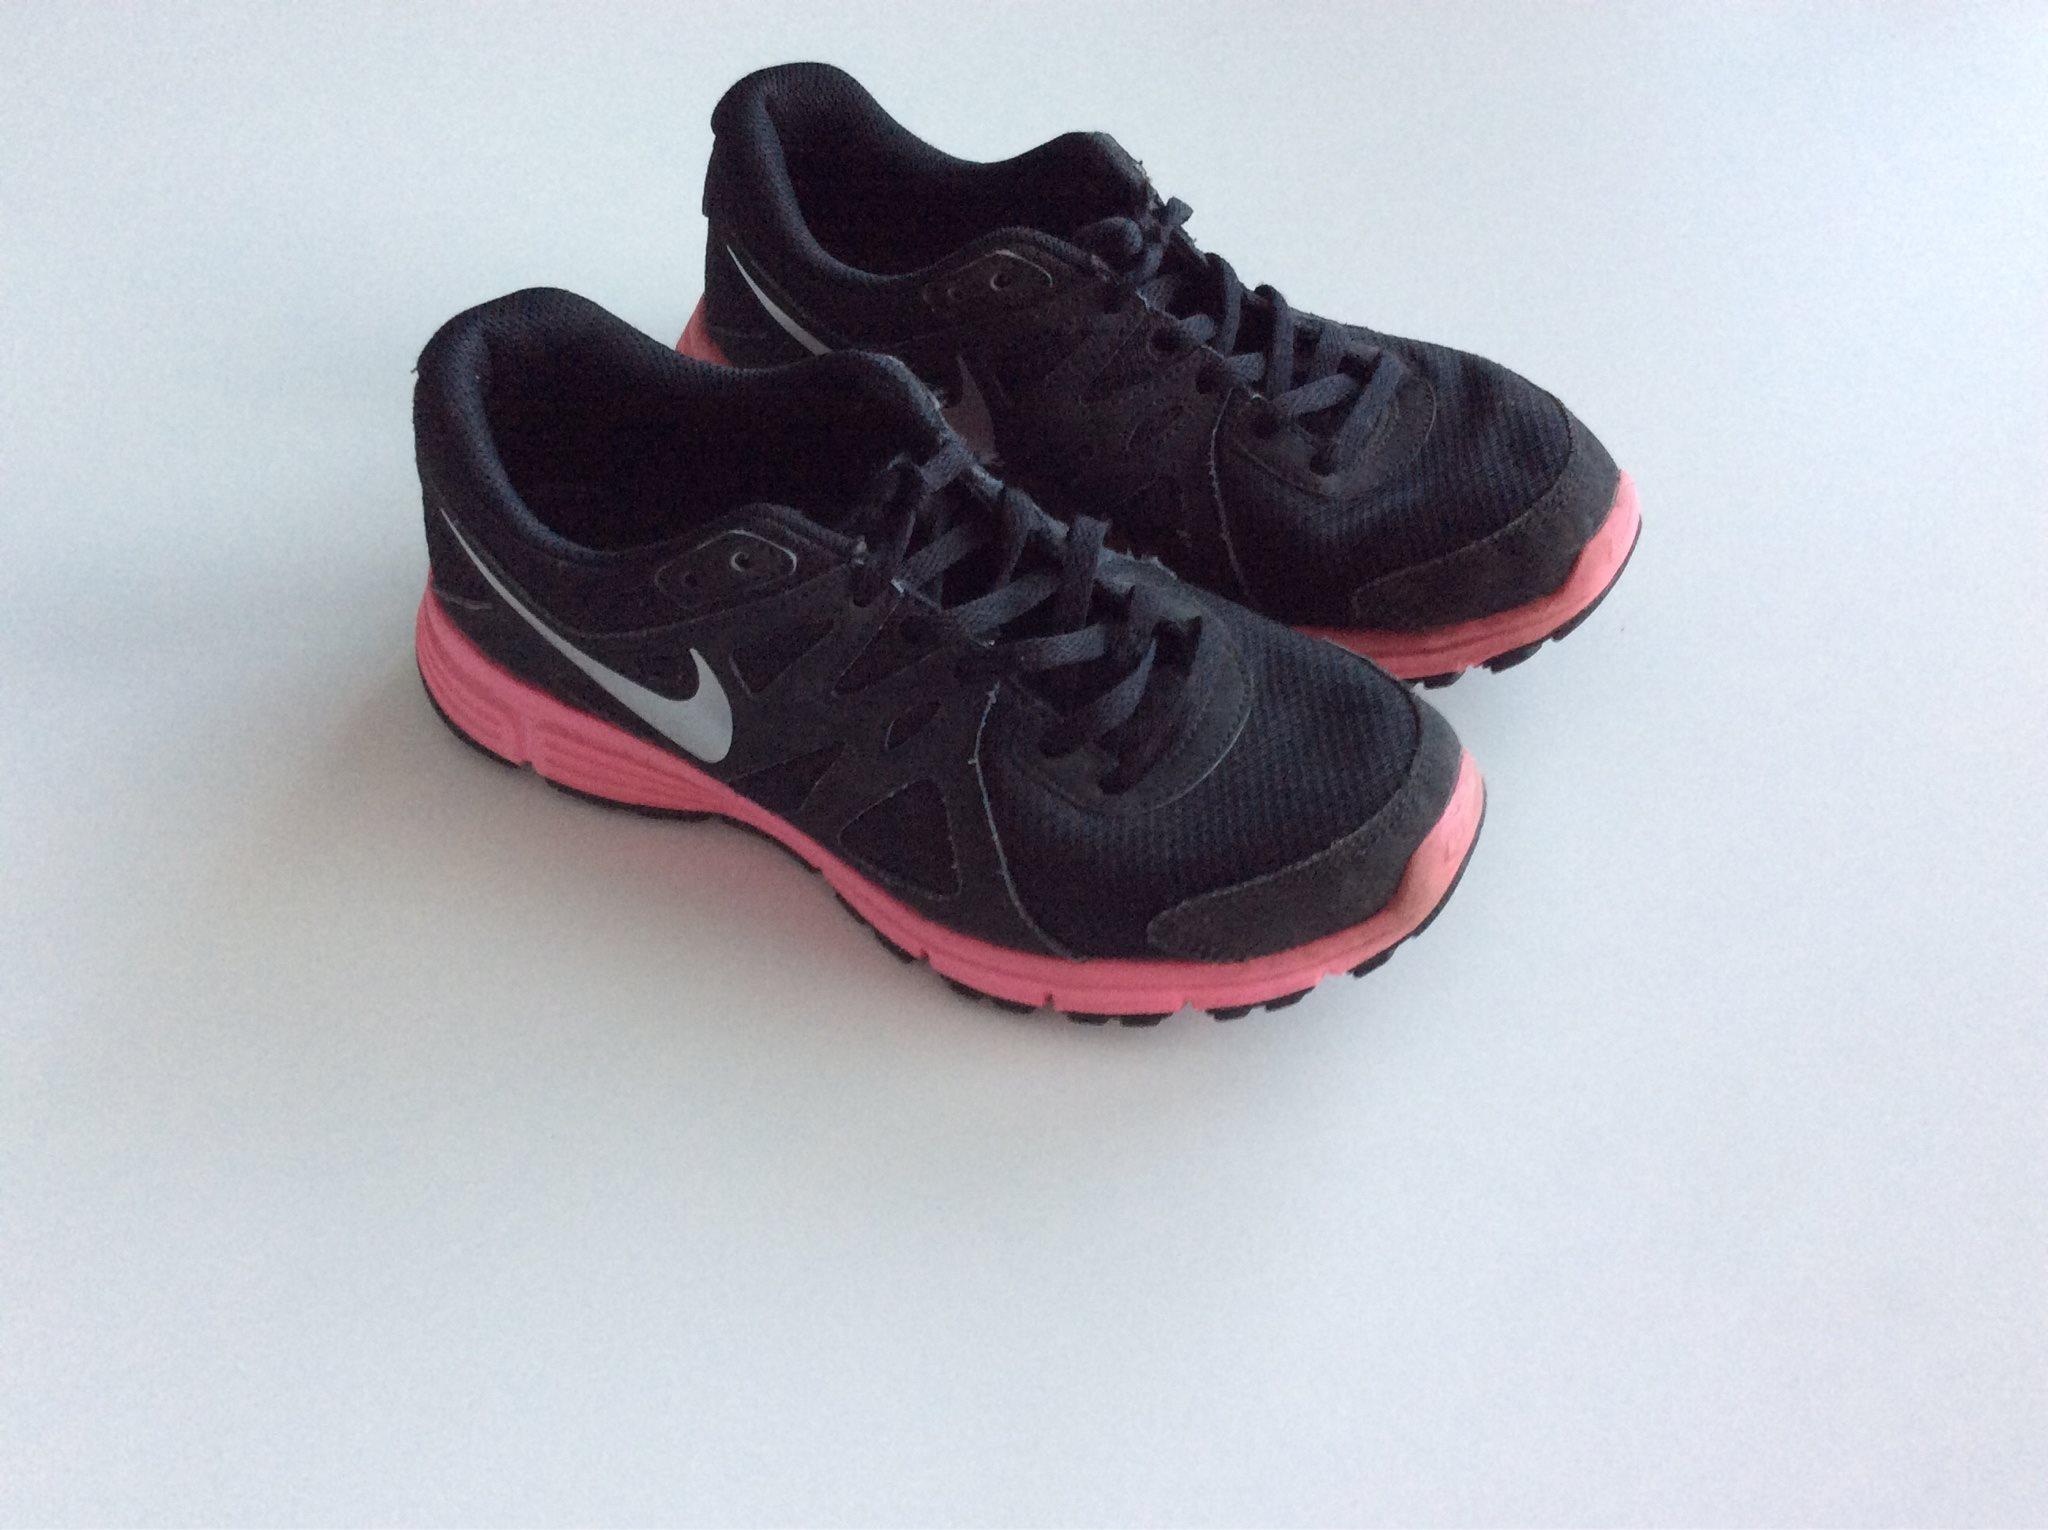 buy popular 52dd1 cf956 Rea Nike Air Max 90 Premium Skor Dam Svarta Vita-SE 951934   Köp Nike Skor  Online HbqJBaCB,nike svarta